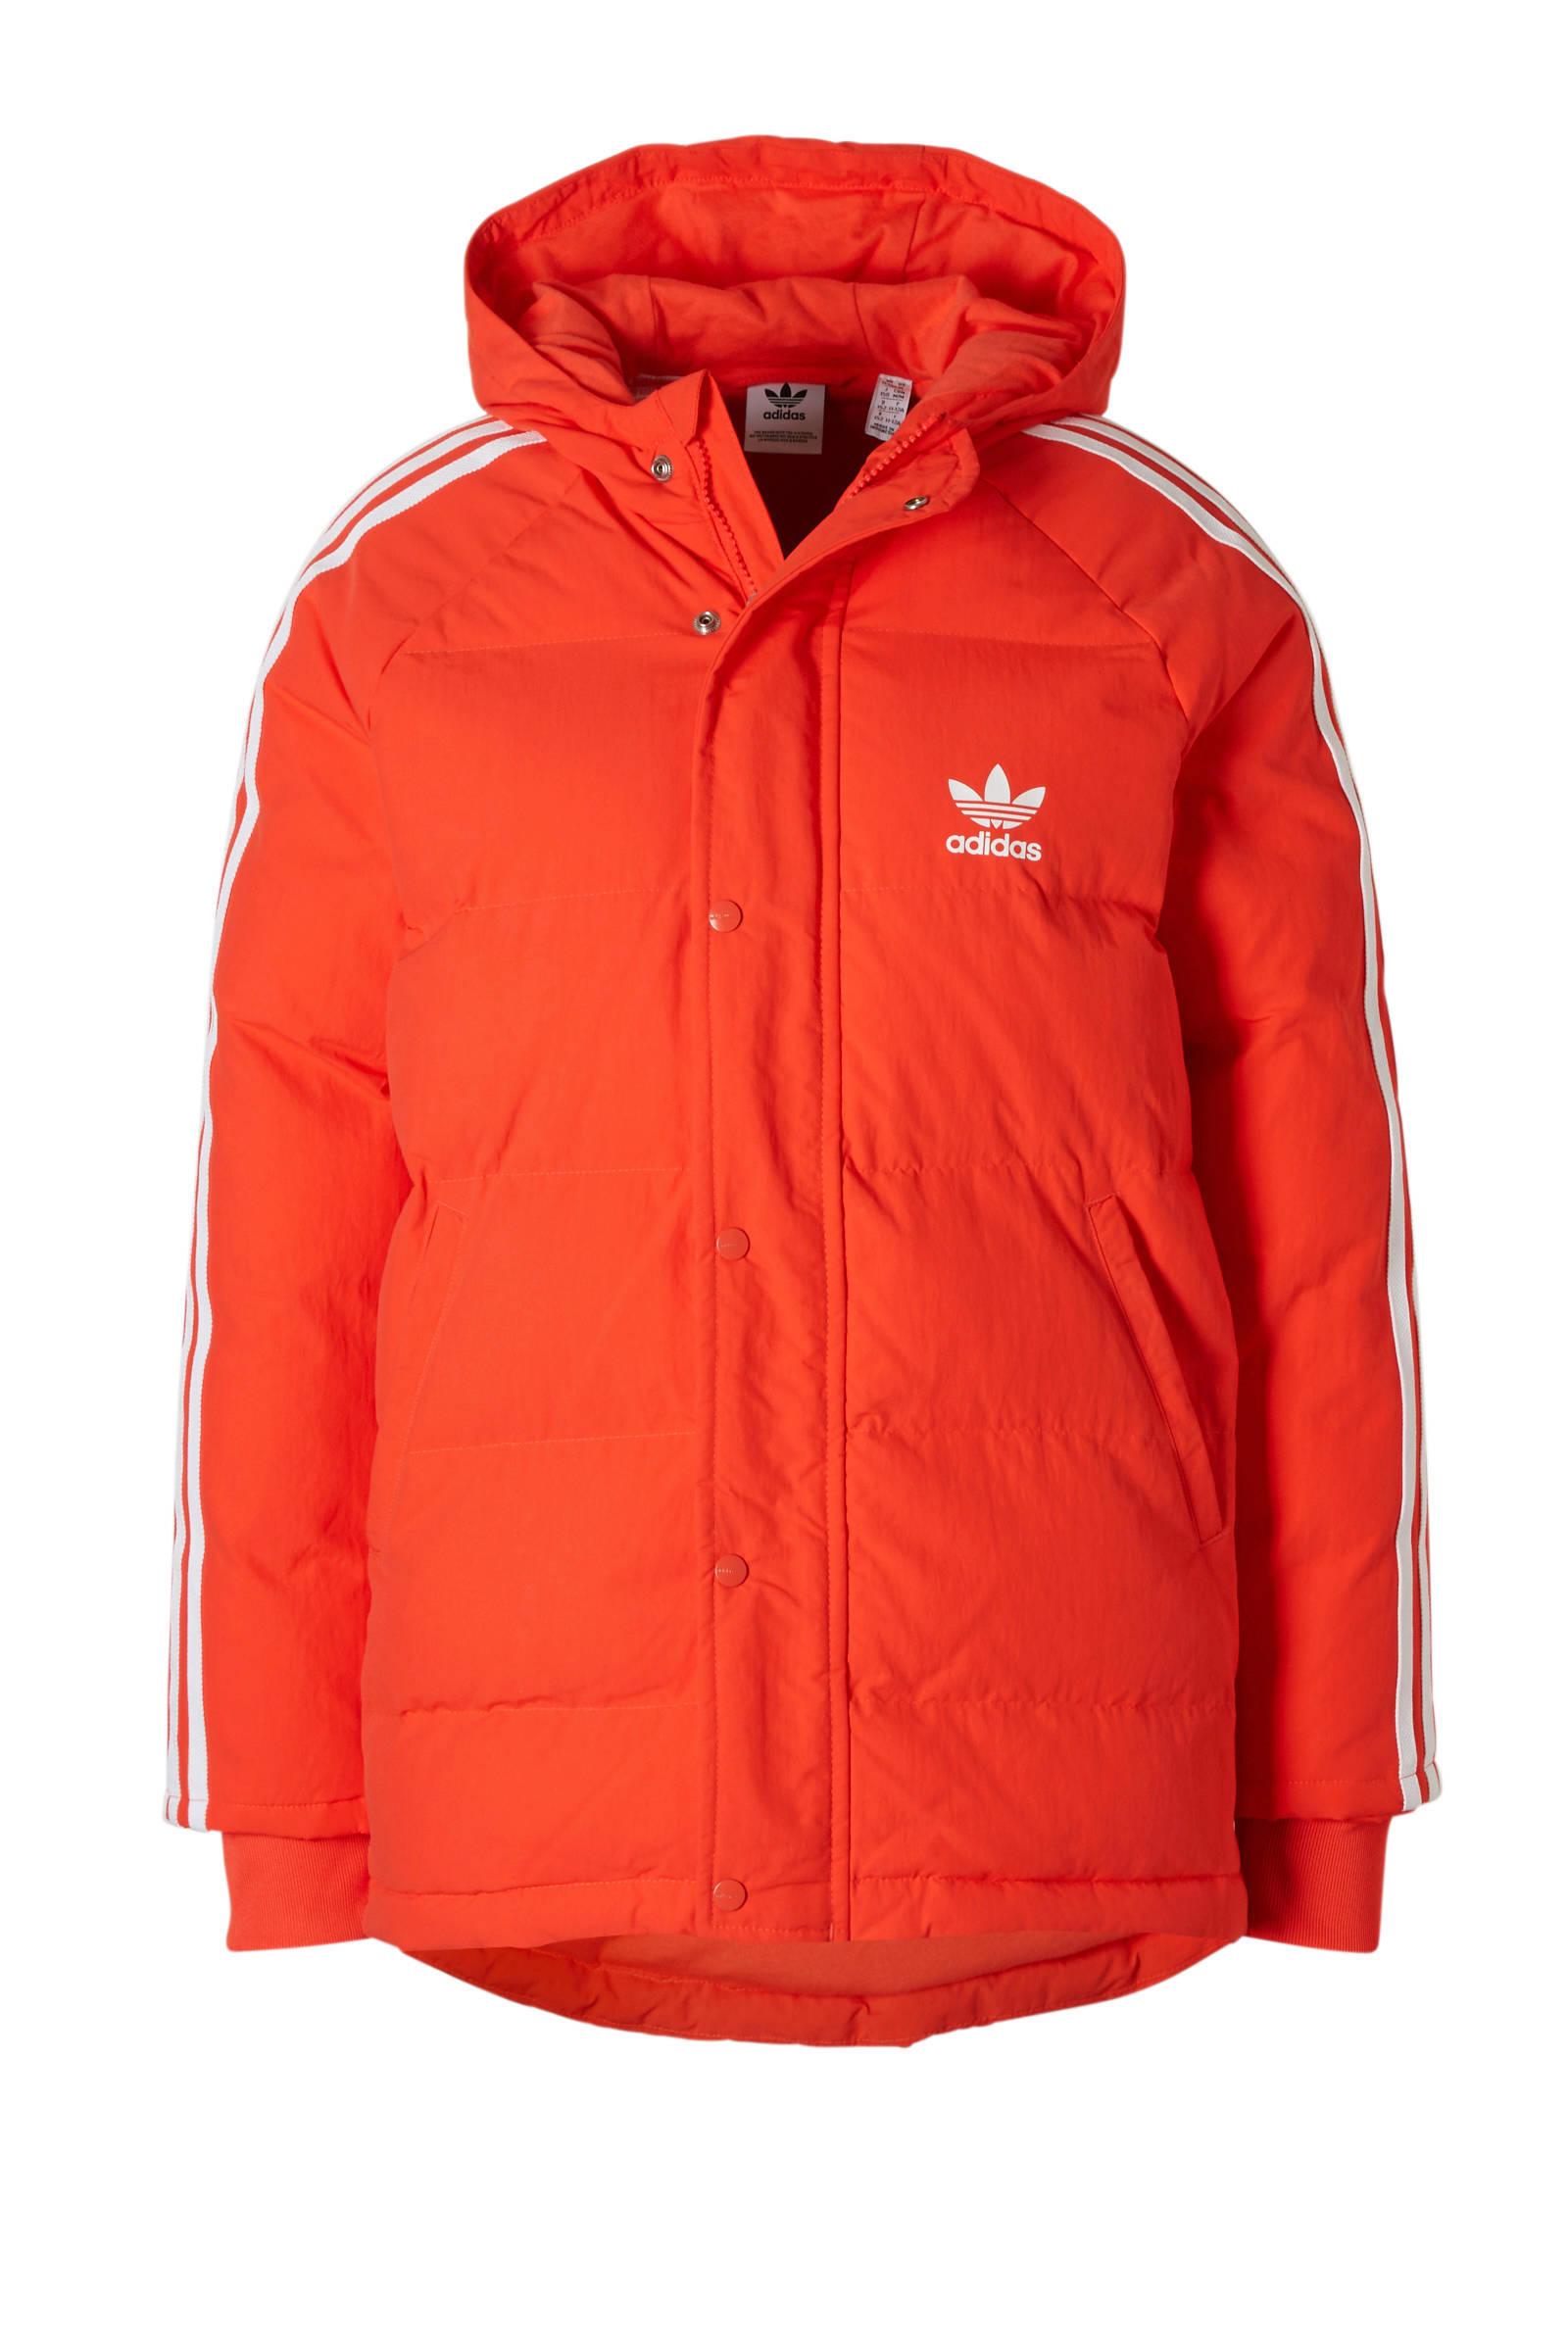 adidas Originals winterjas oranje | wehkamp